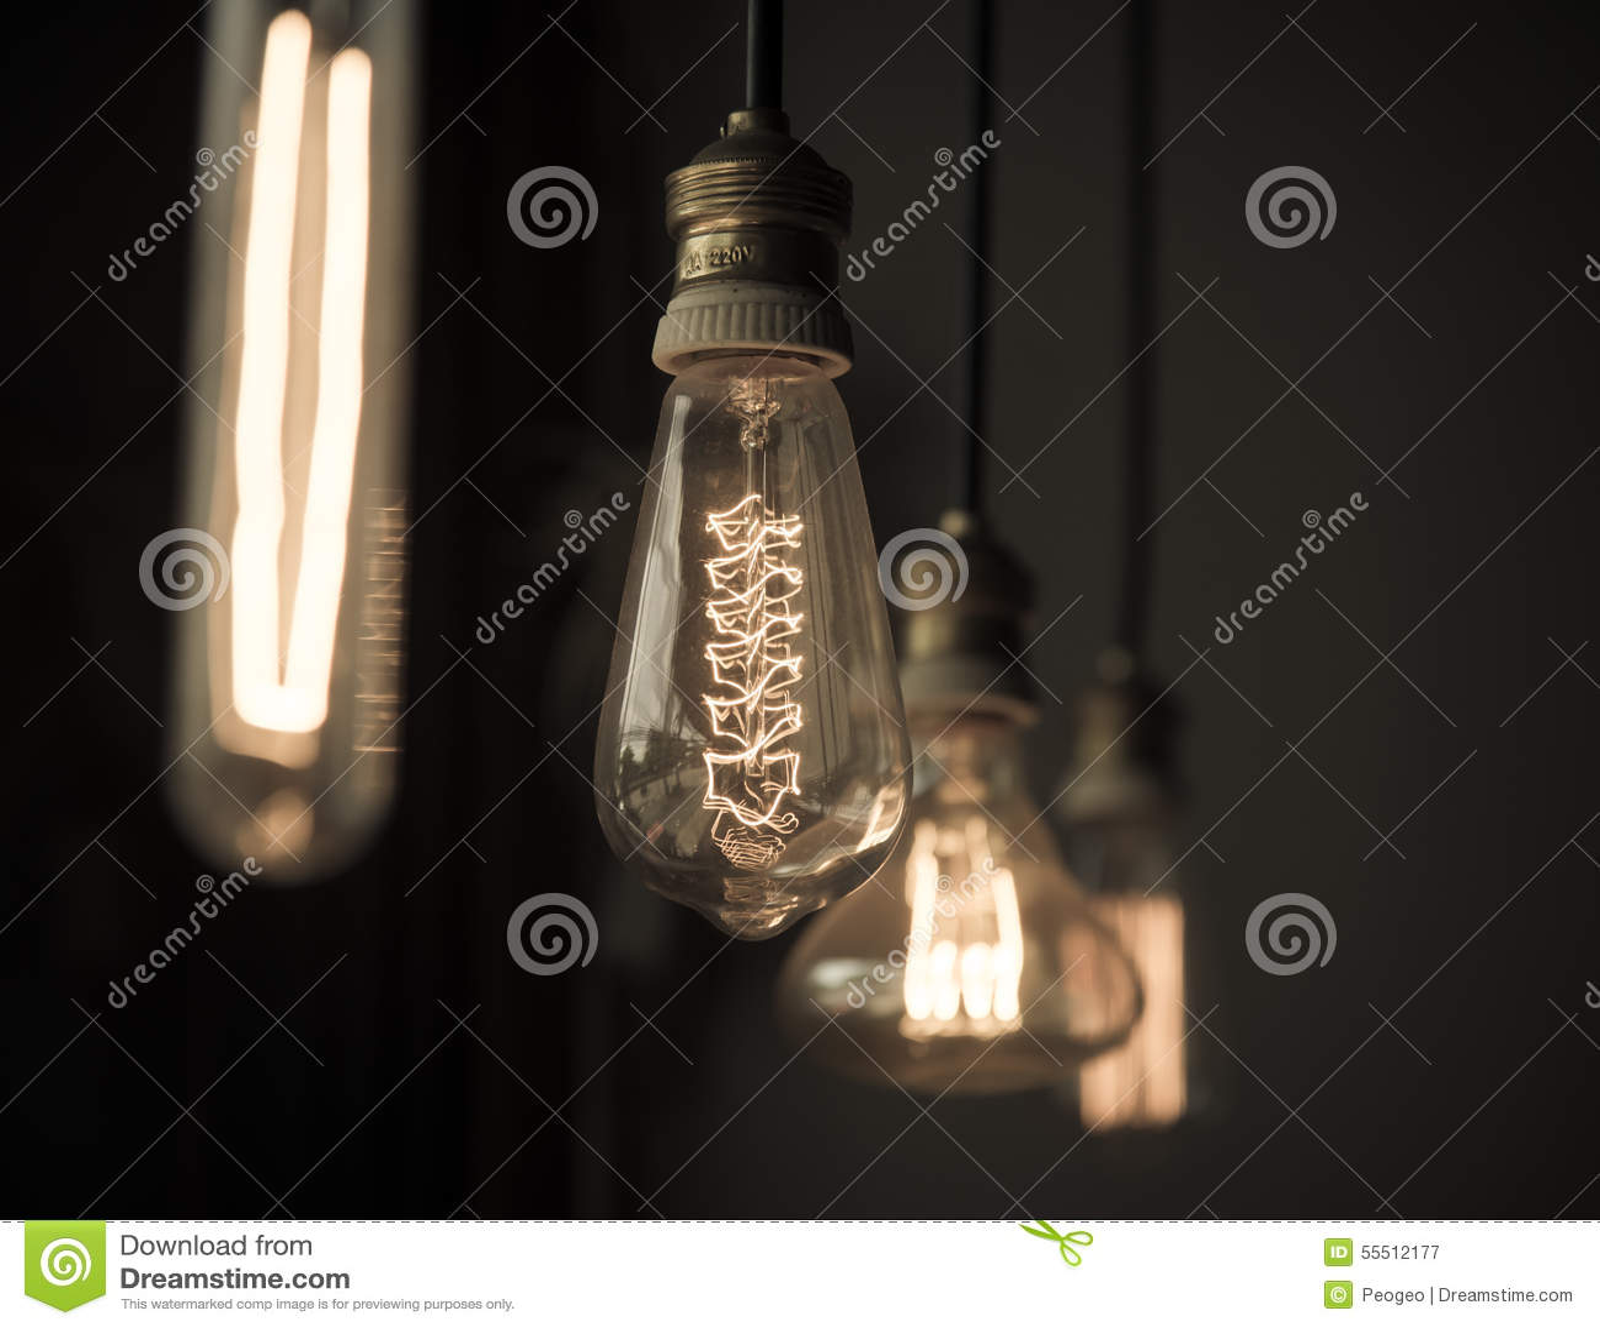 Dark room with light bulb - Hanged Light Bulbs In Dark Room Vintage